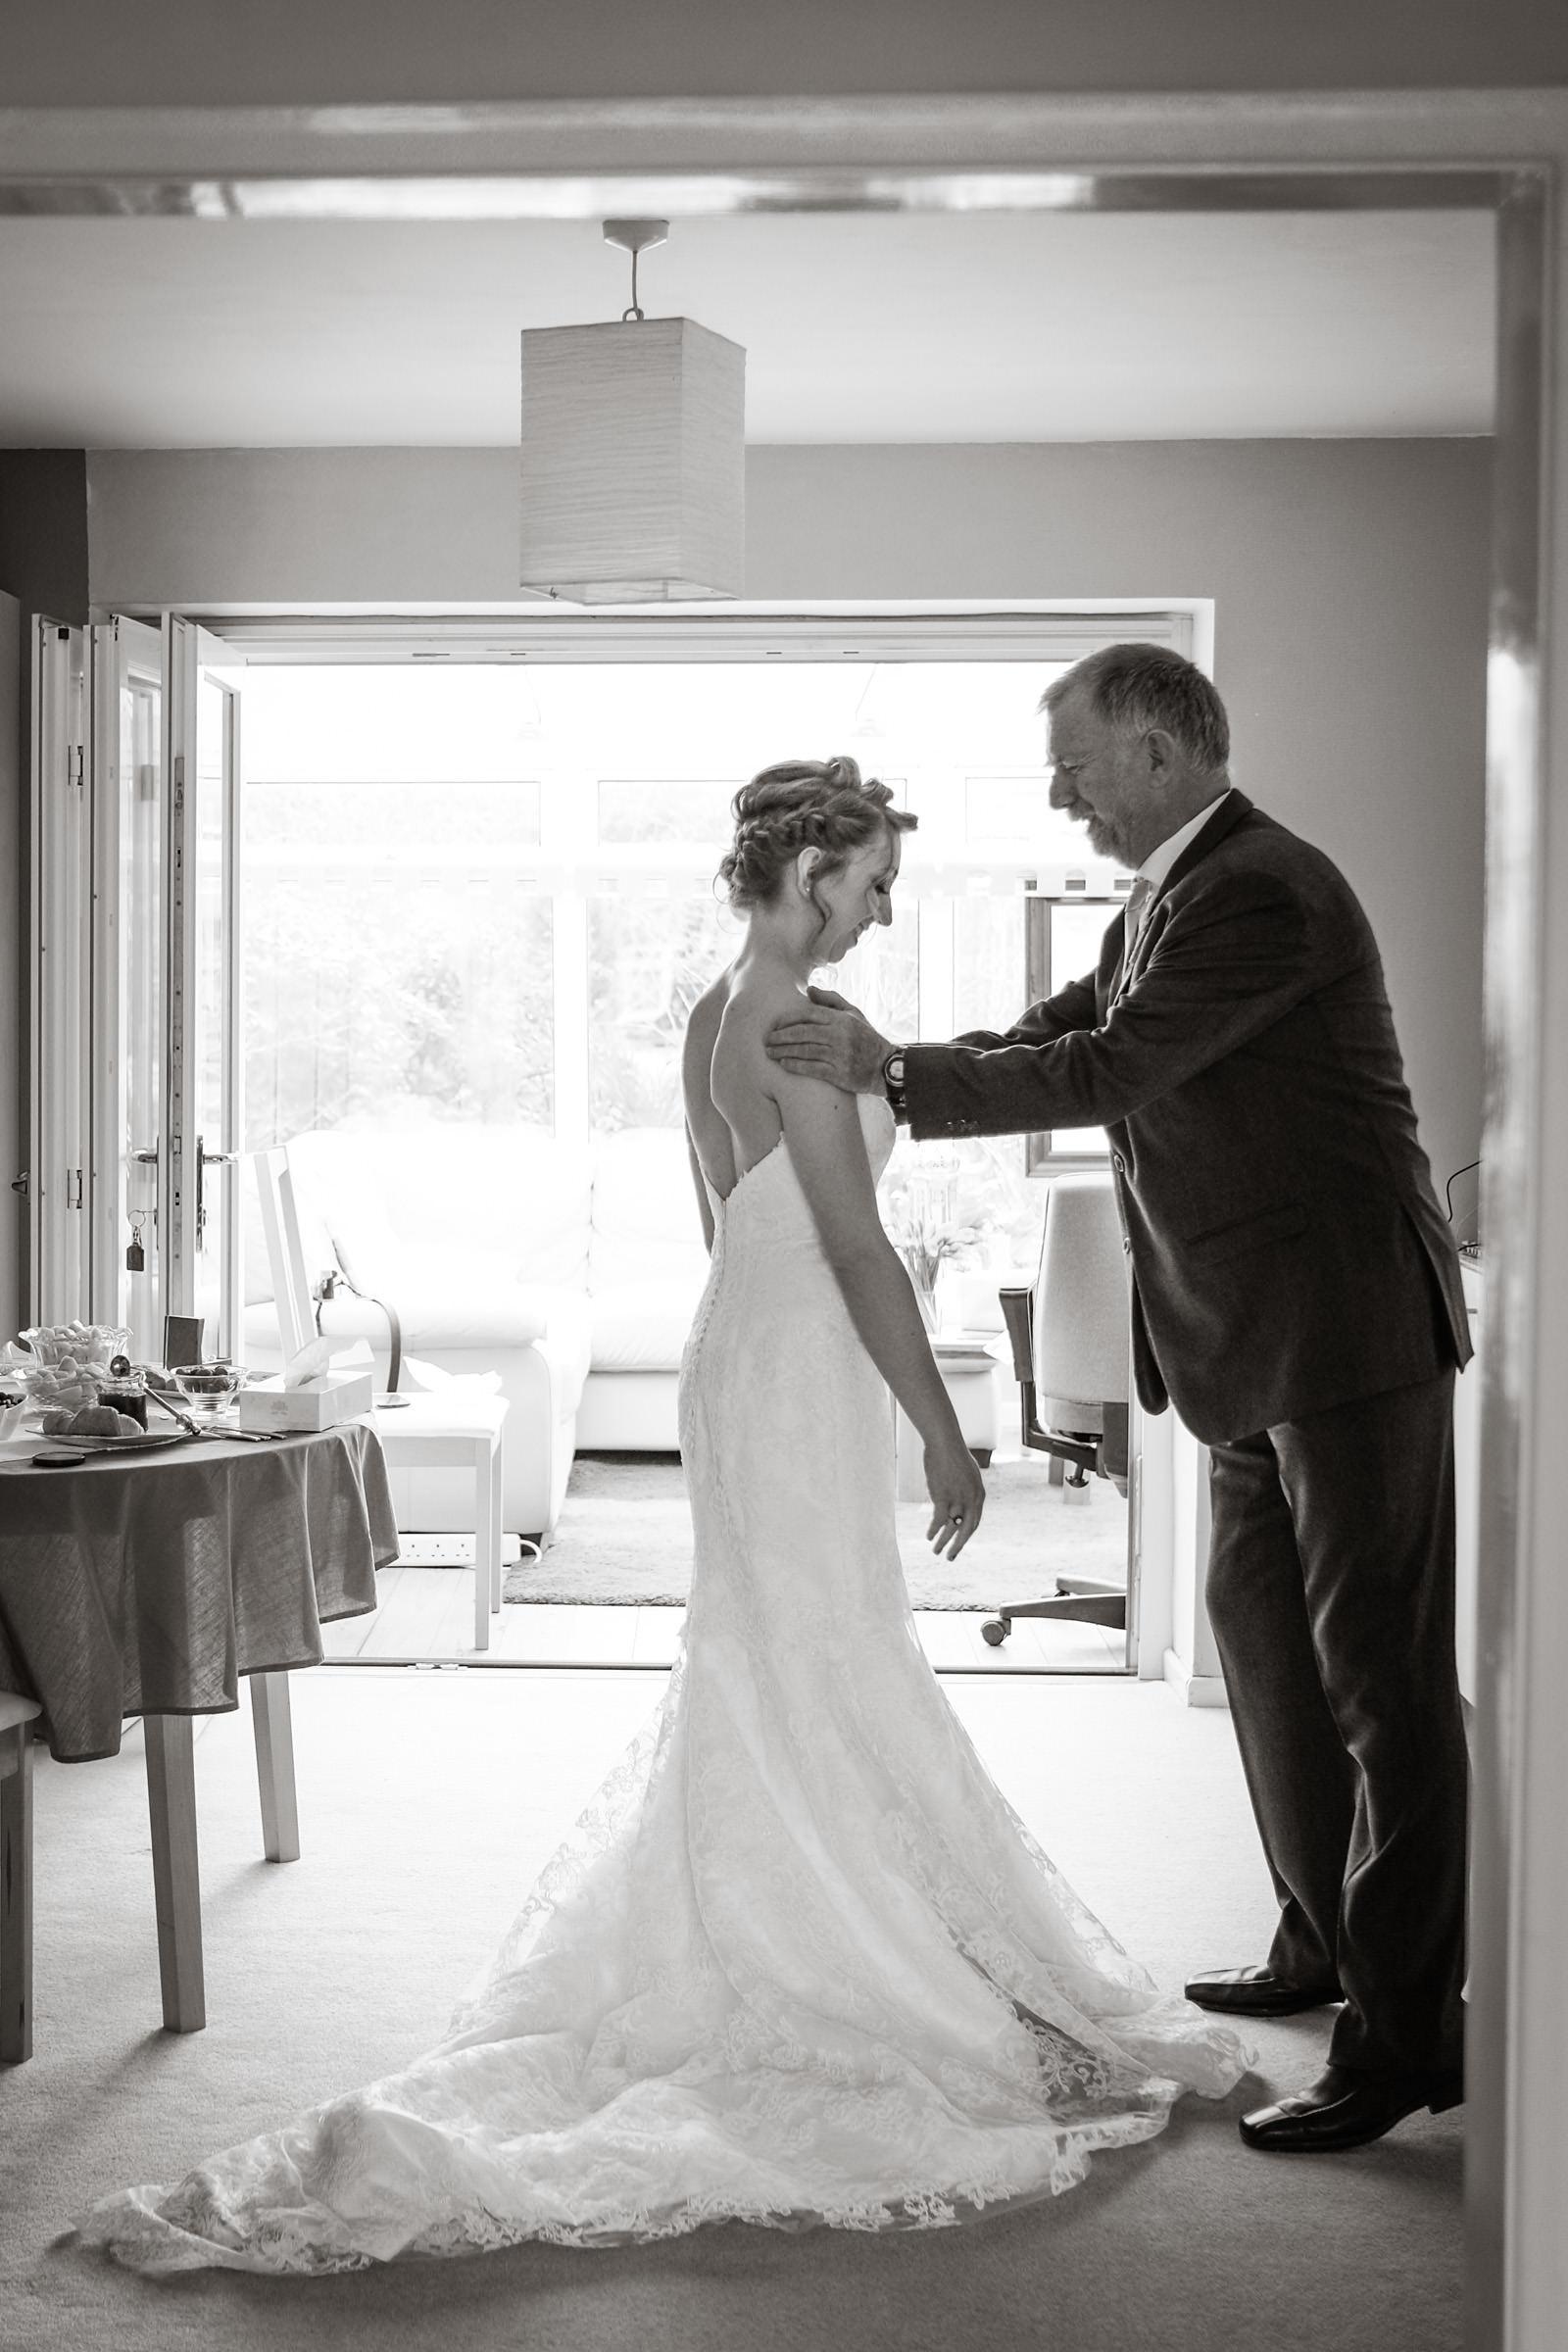 Wedding at Royal Holloway University in Surrey 007.jpg